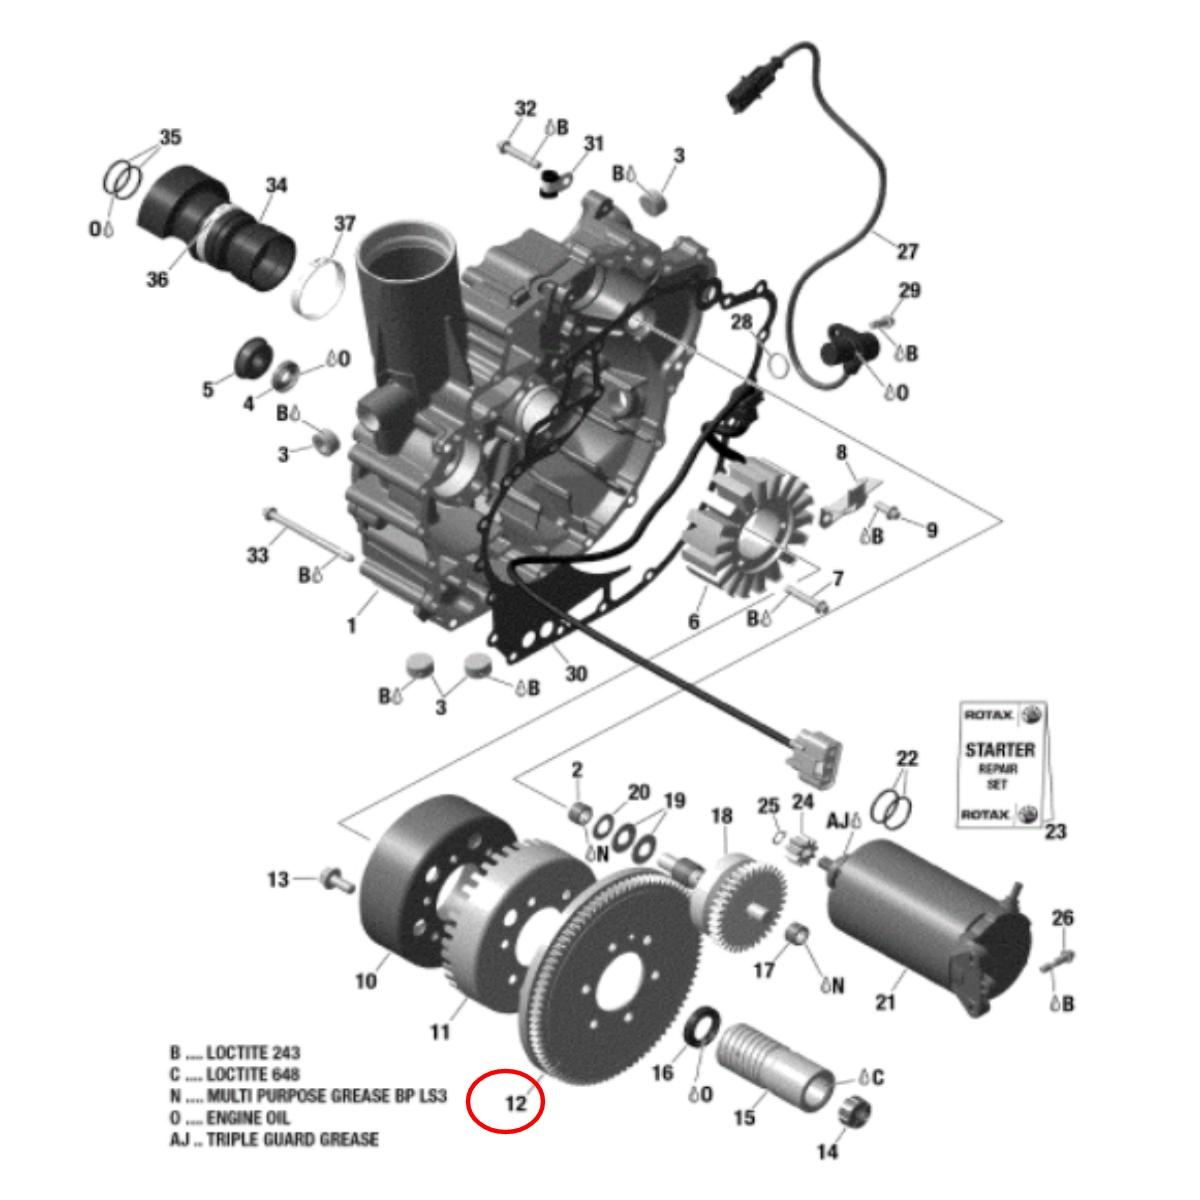 Cremalheira para Jet Ski Sea Doo GTI/GTX 4 TEC Simples  - Radical Peças - Peças para Jet Ski